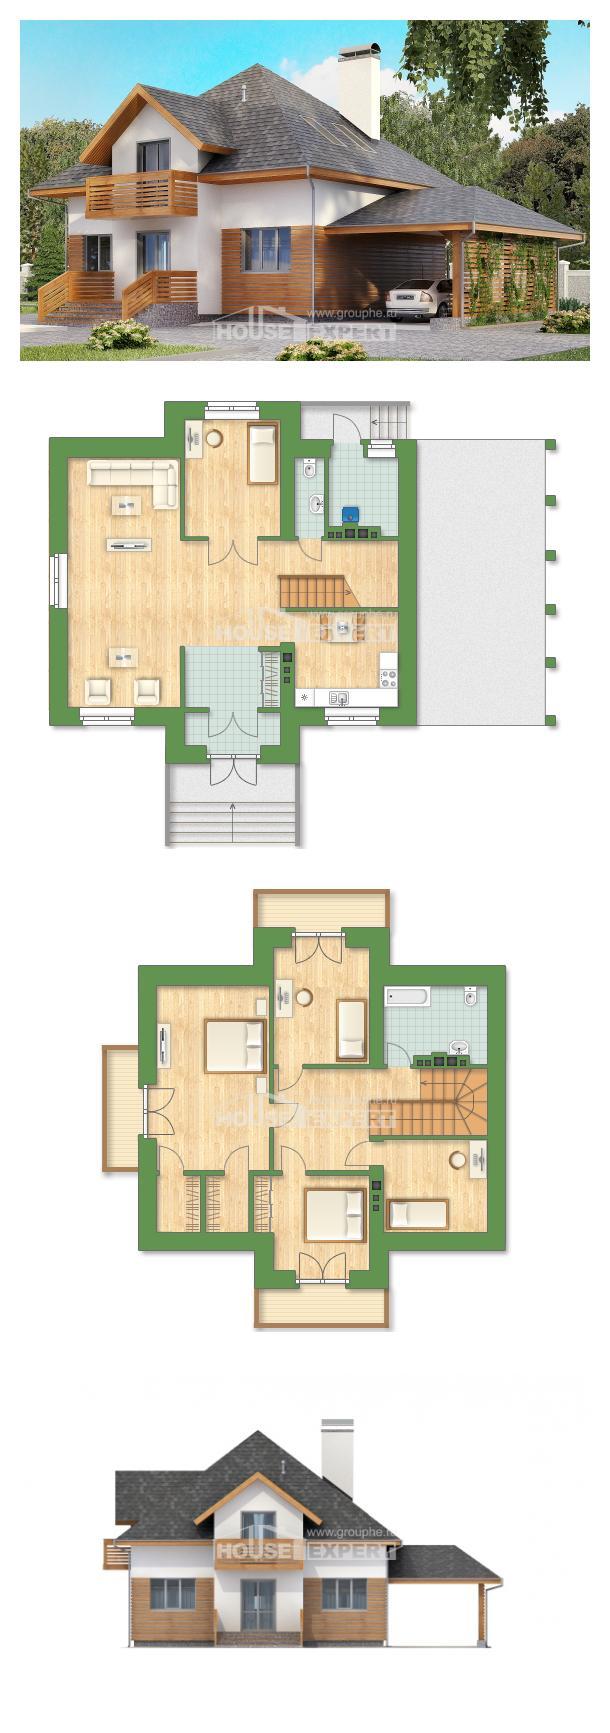 Ev villa projesi 155-004-R   House Expert